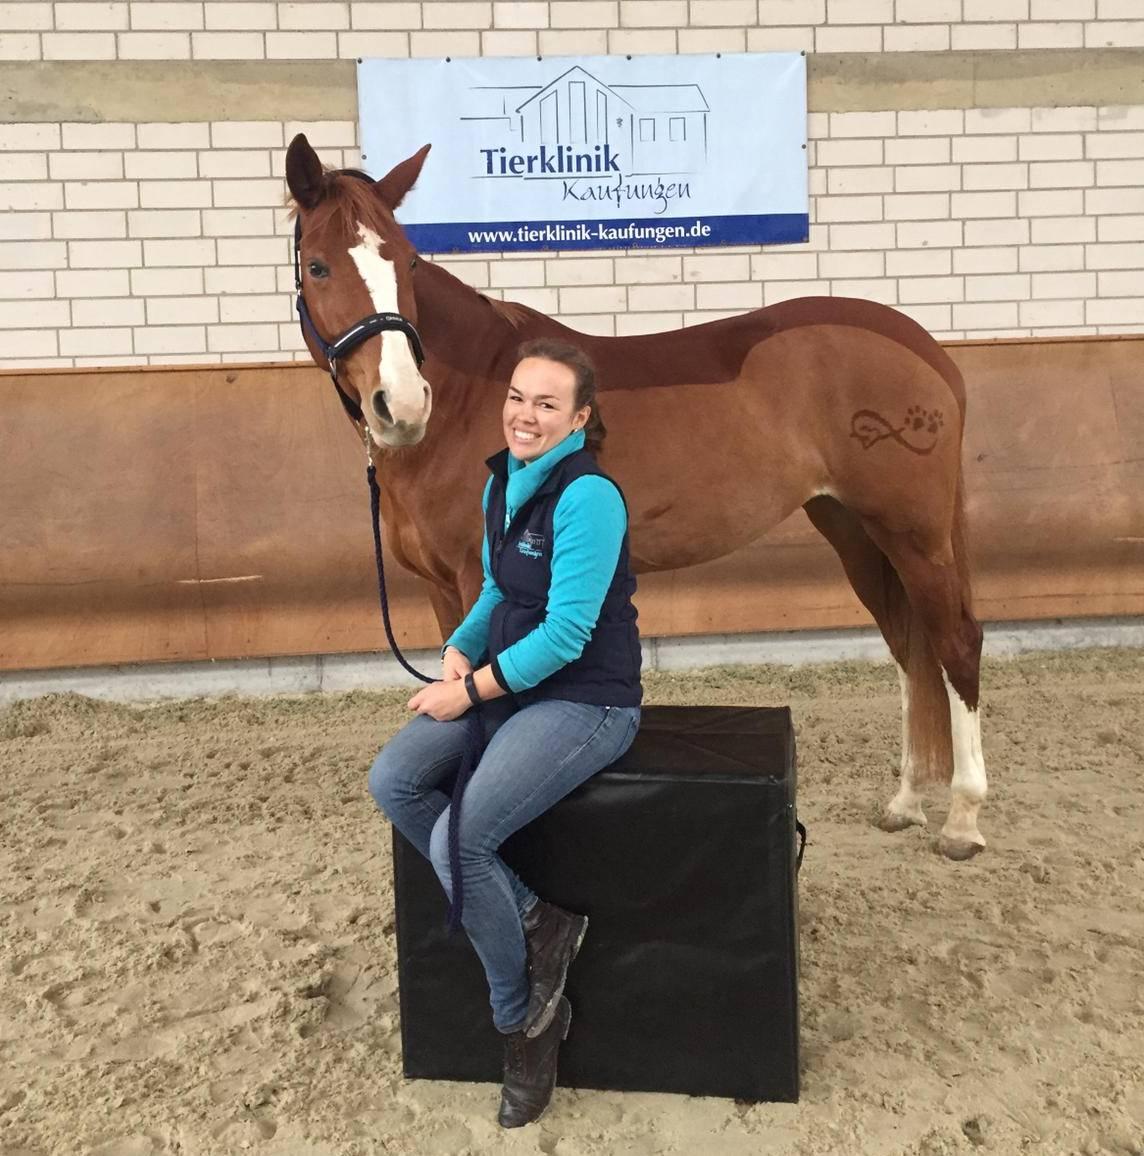 Unsere TFA Janina Osmers hat die Fortbildung zur DIPO Physiotherapeutin abgeschlossen